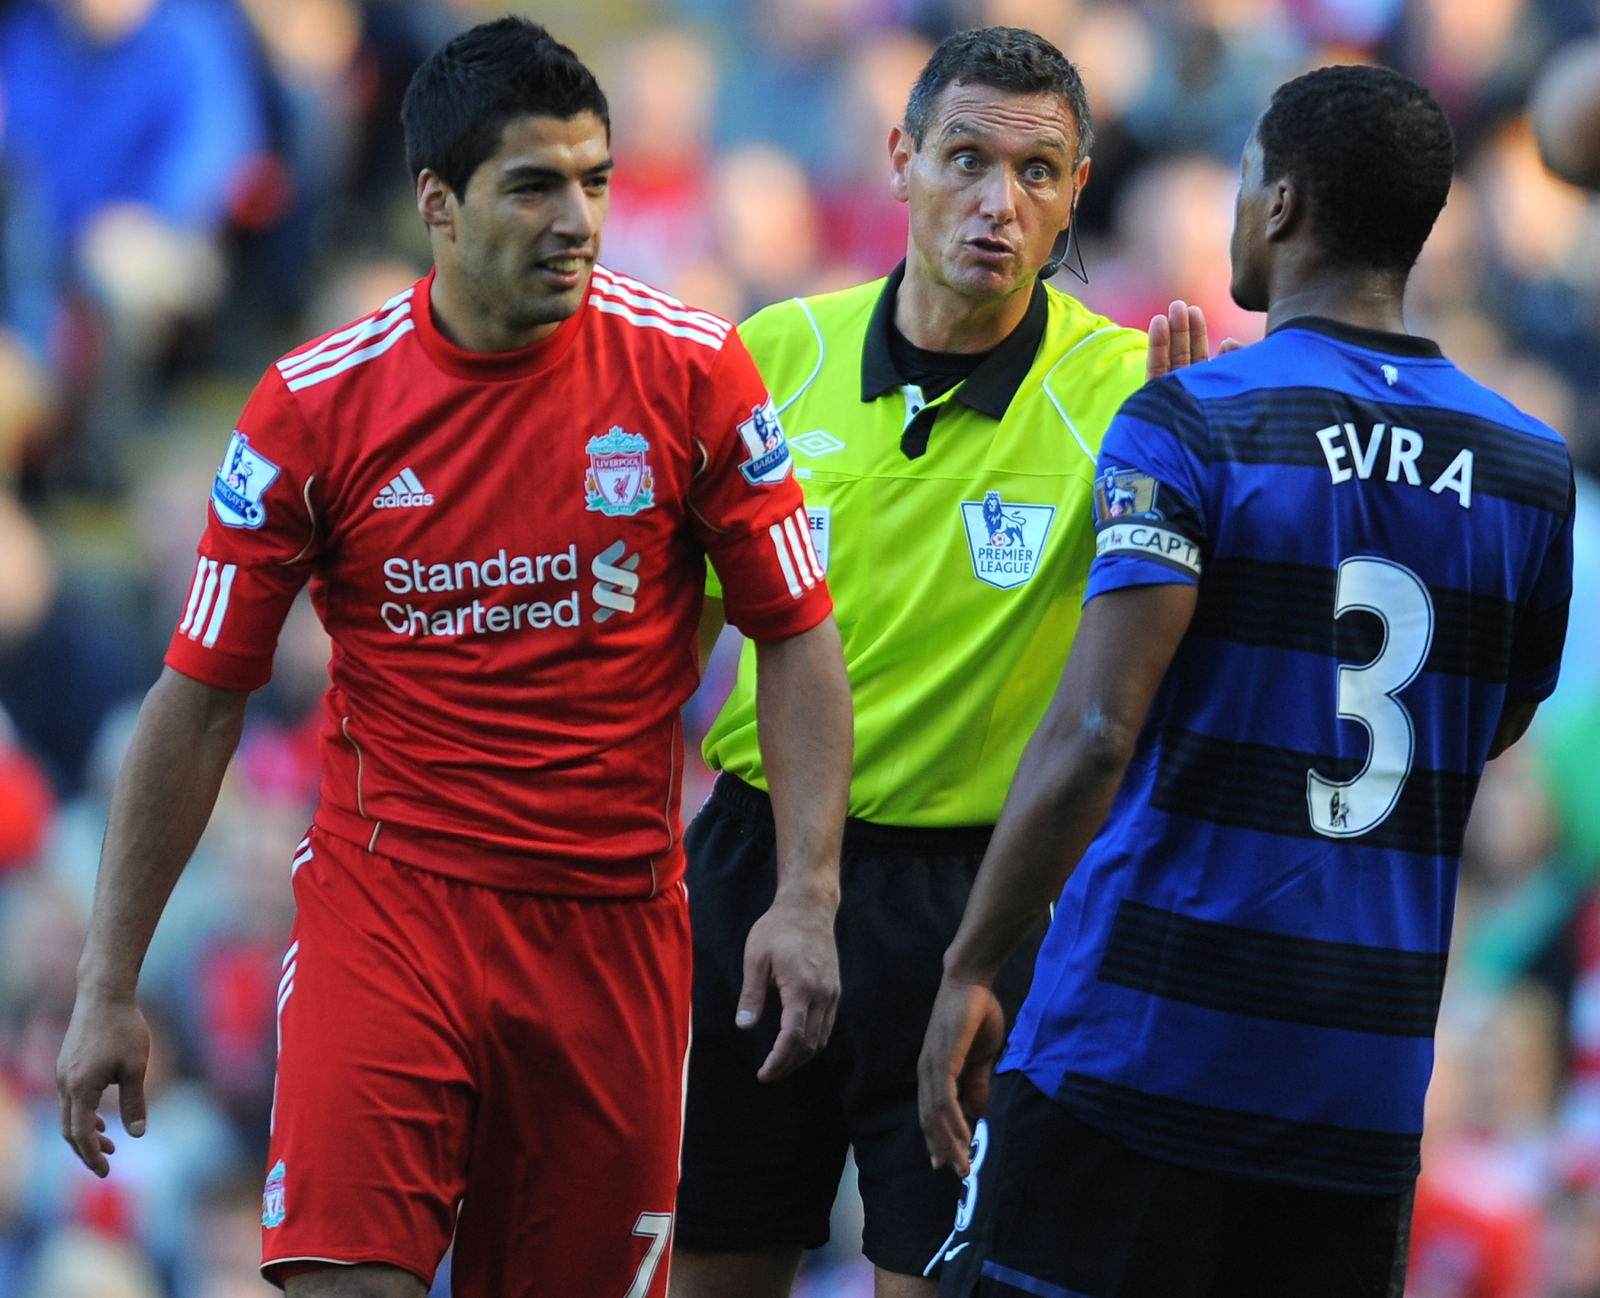 Luis Suarez (left) and Patrice Evra